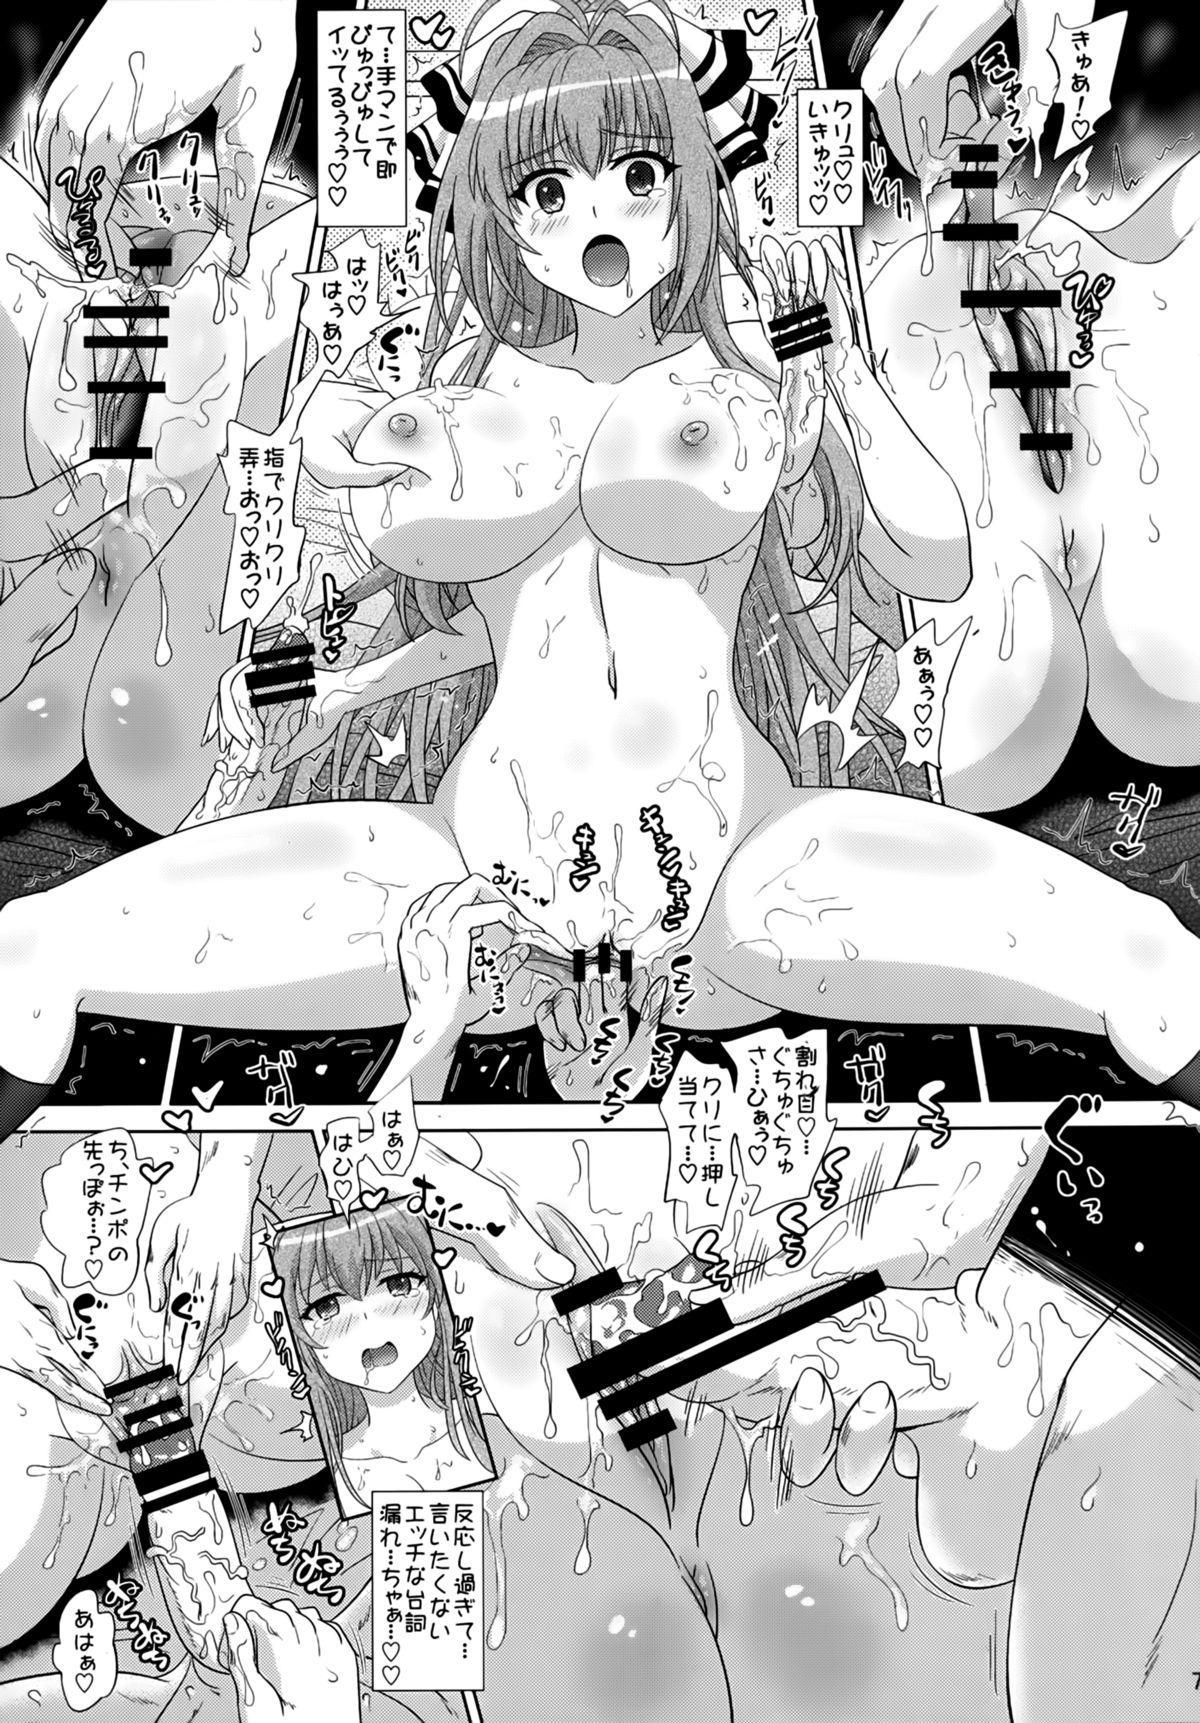 Amagi no Ecchi na Yuuenchi 6